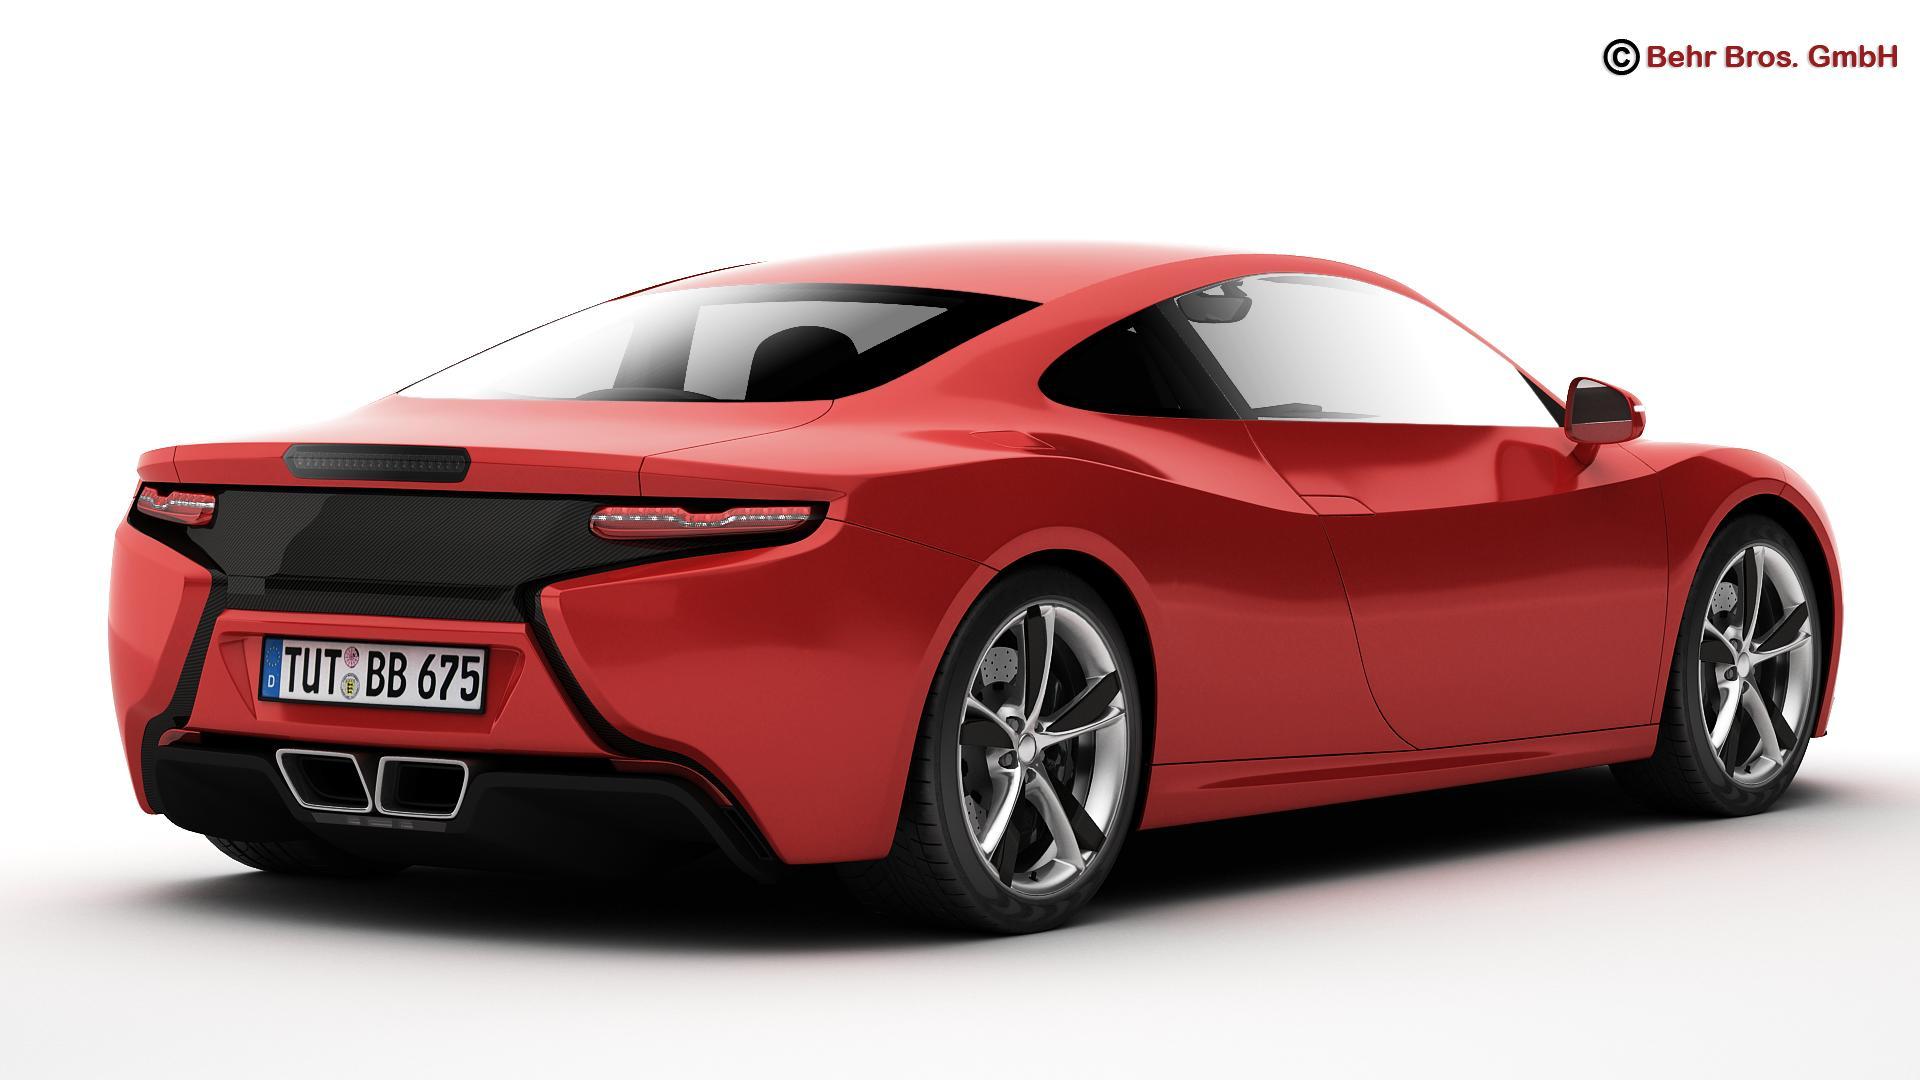 generic sports car 3d model 3ds max fbx c4d lwo ma mb obj 160521